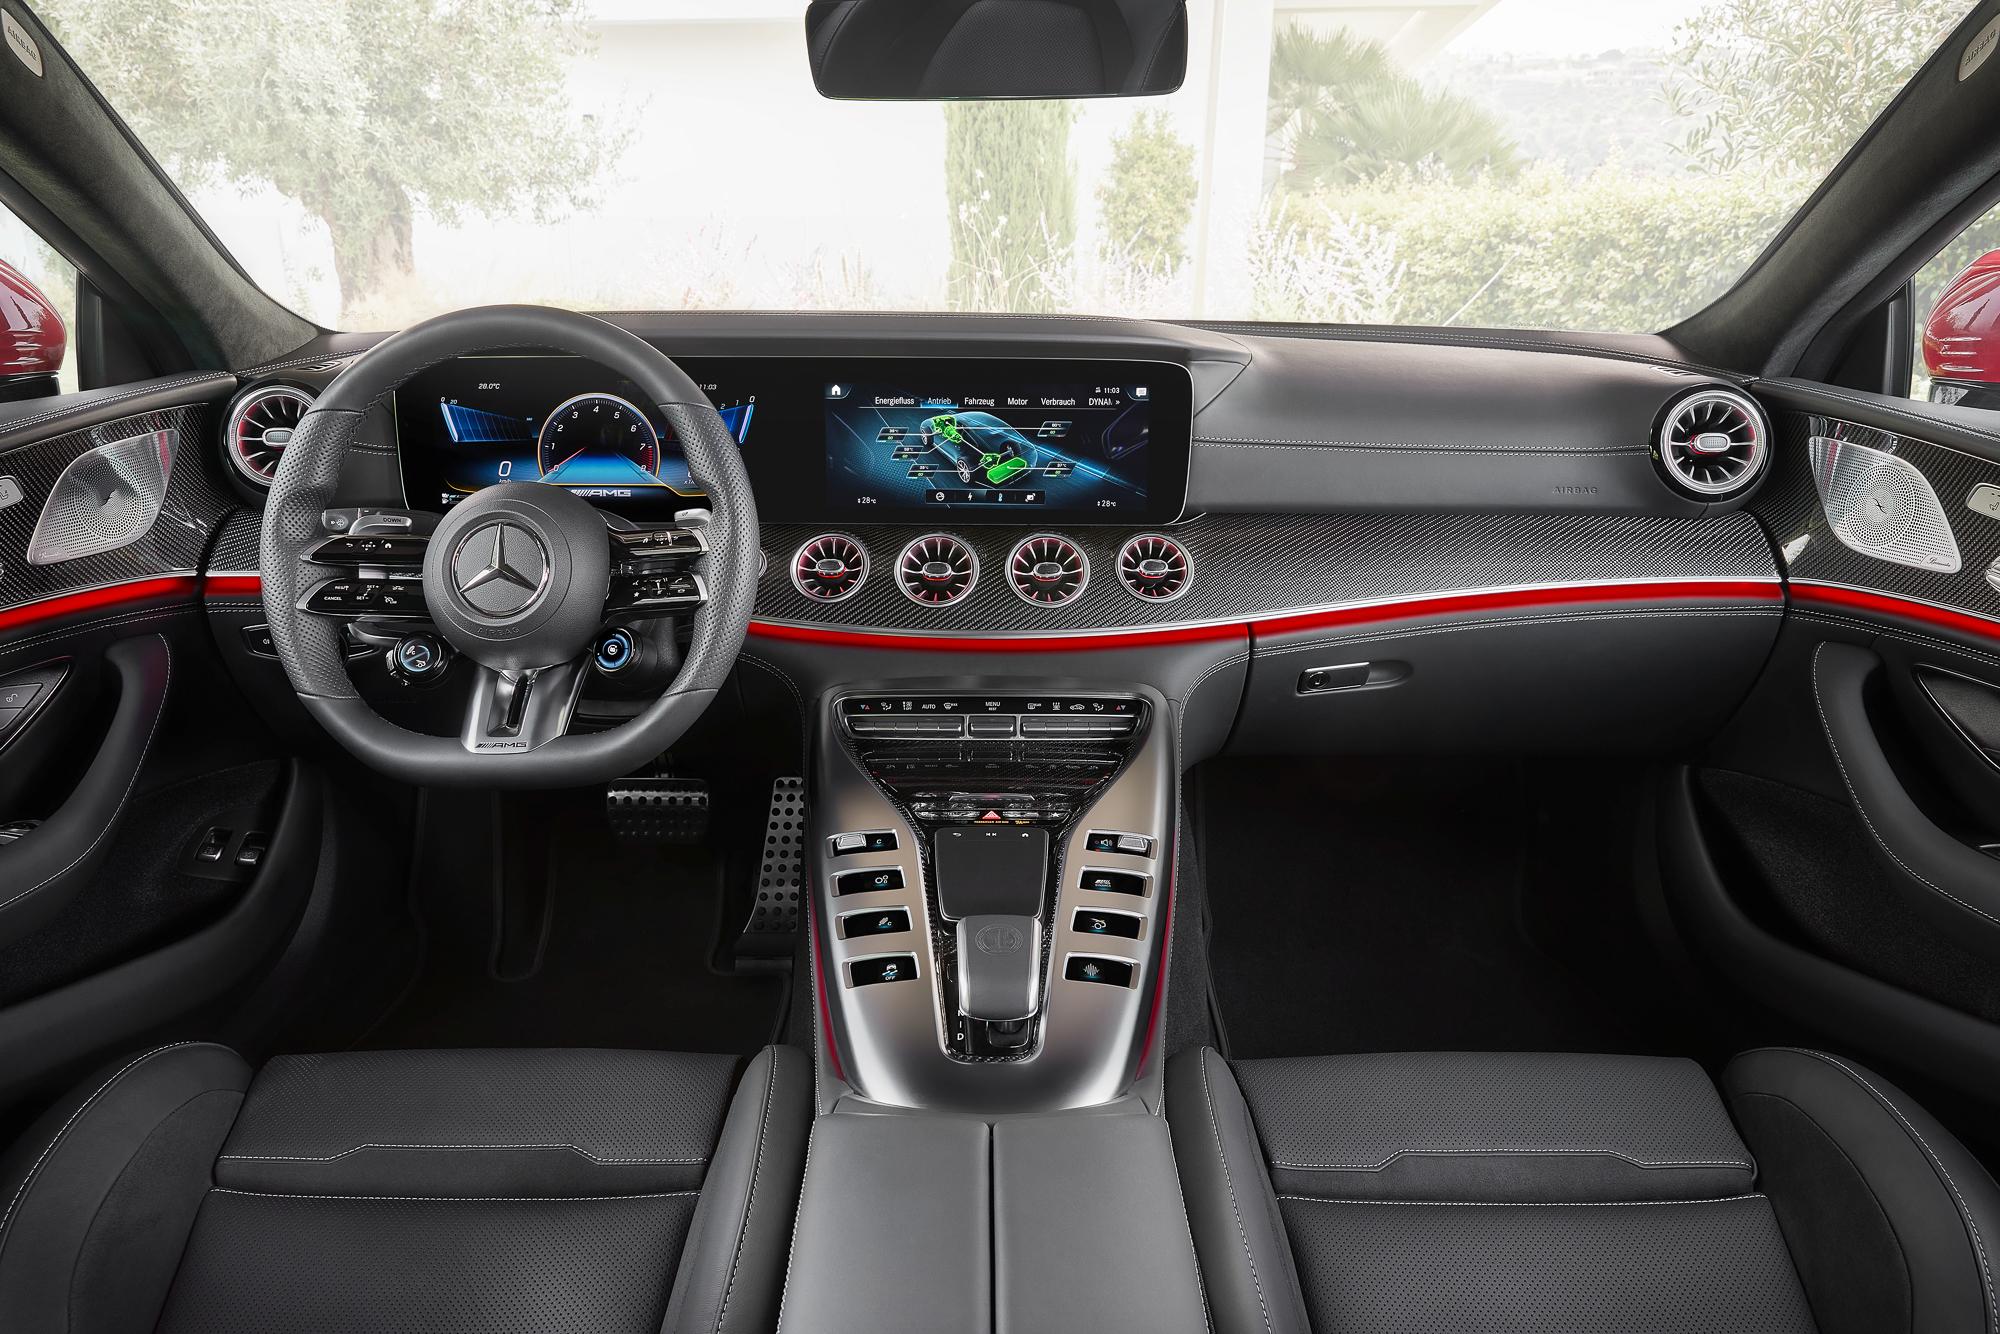 2023-Mercedes-AMG-GT-63-S-E-Performance interior